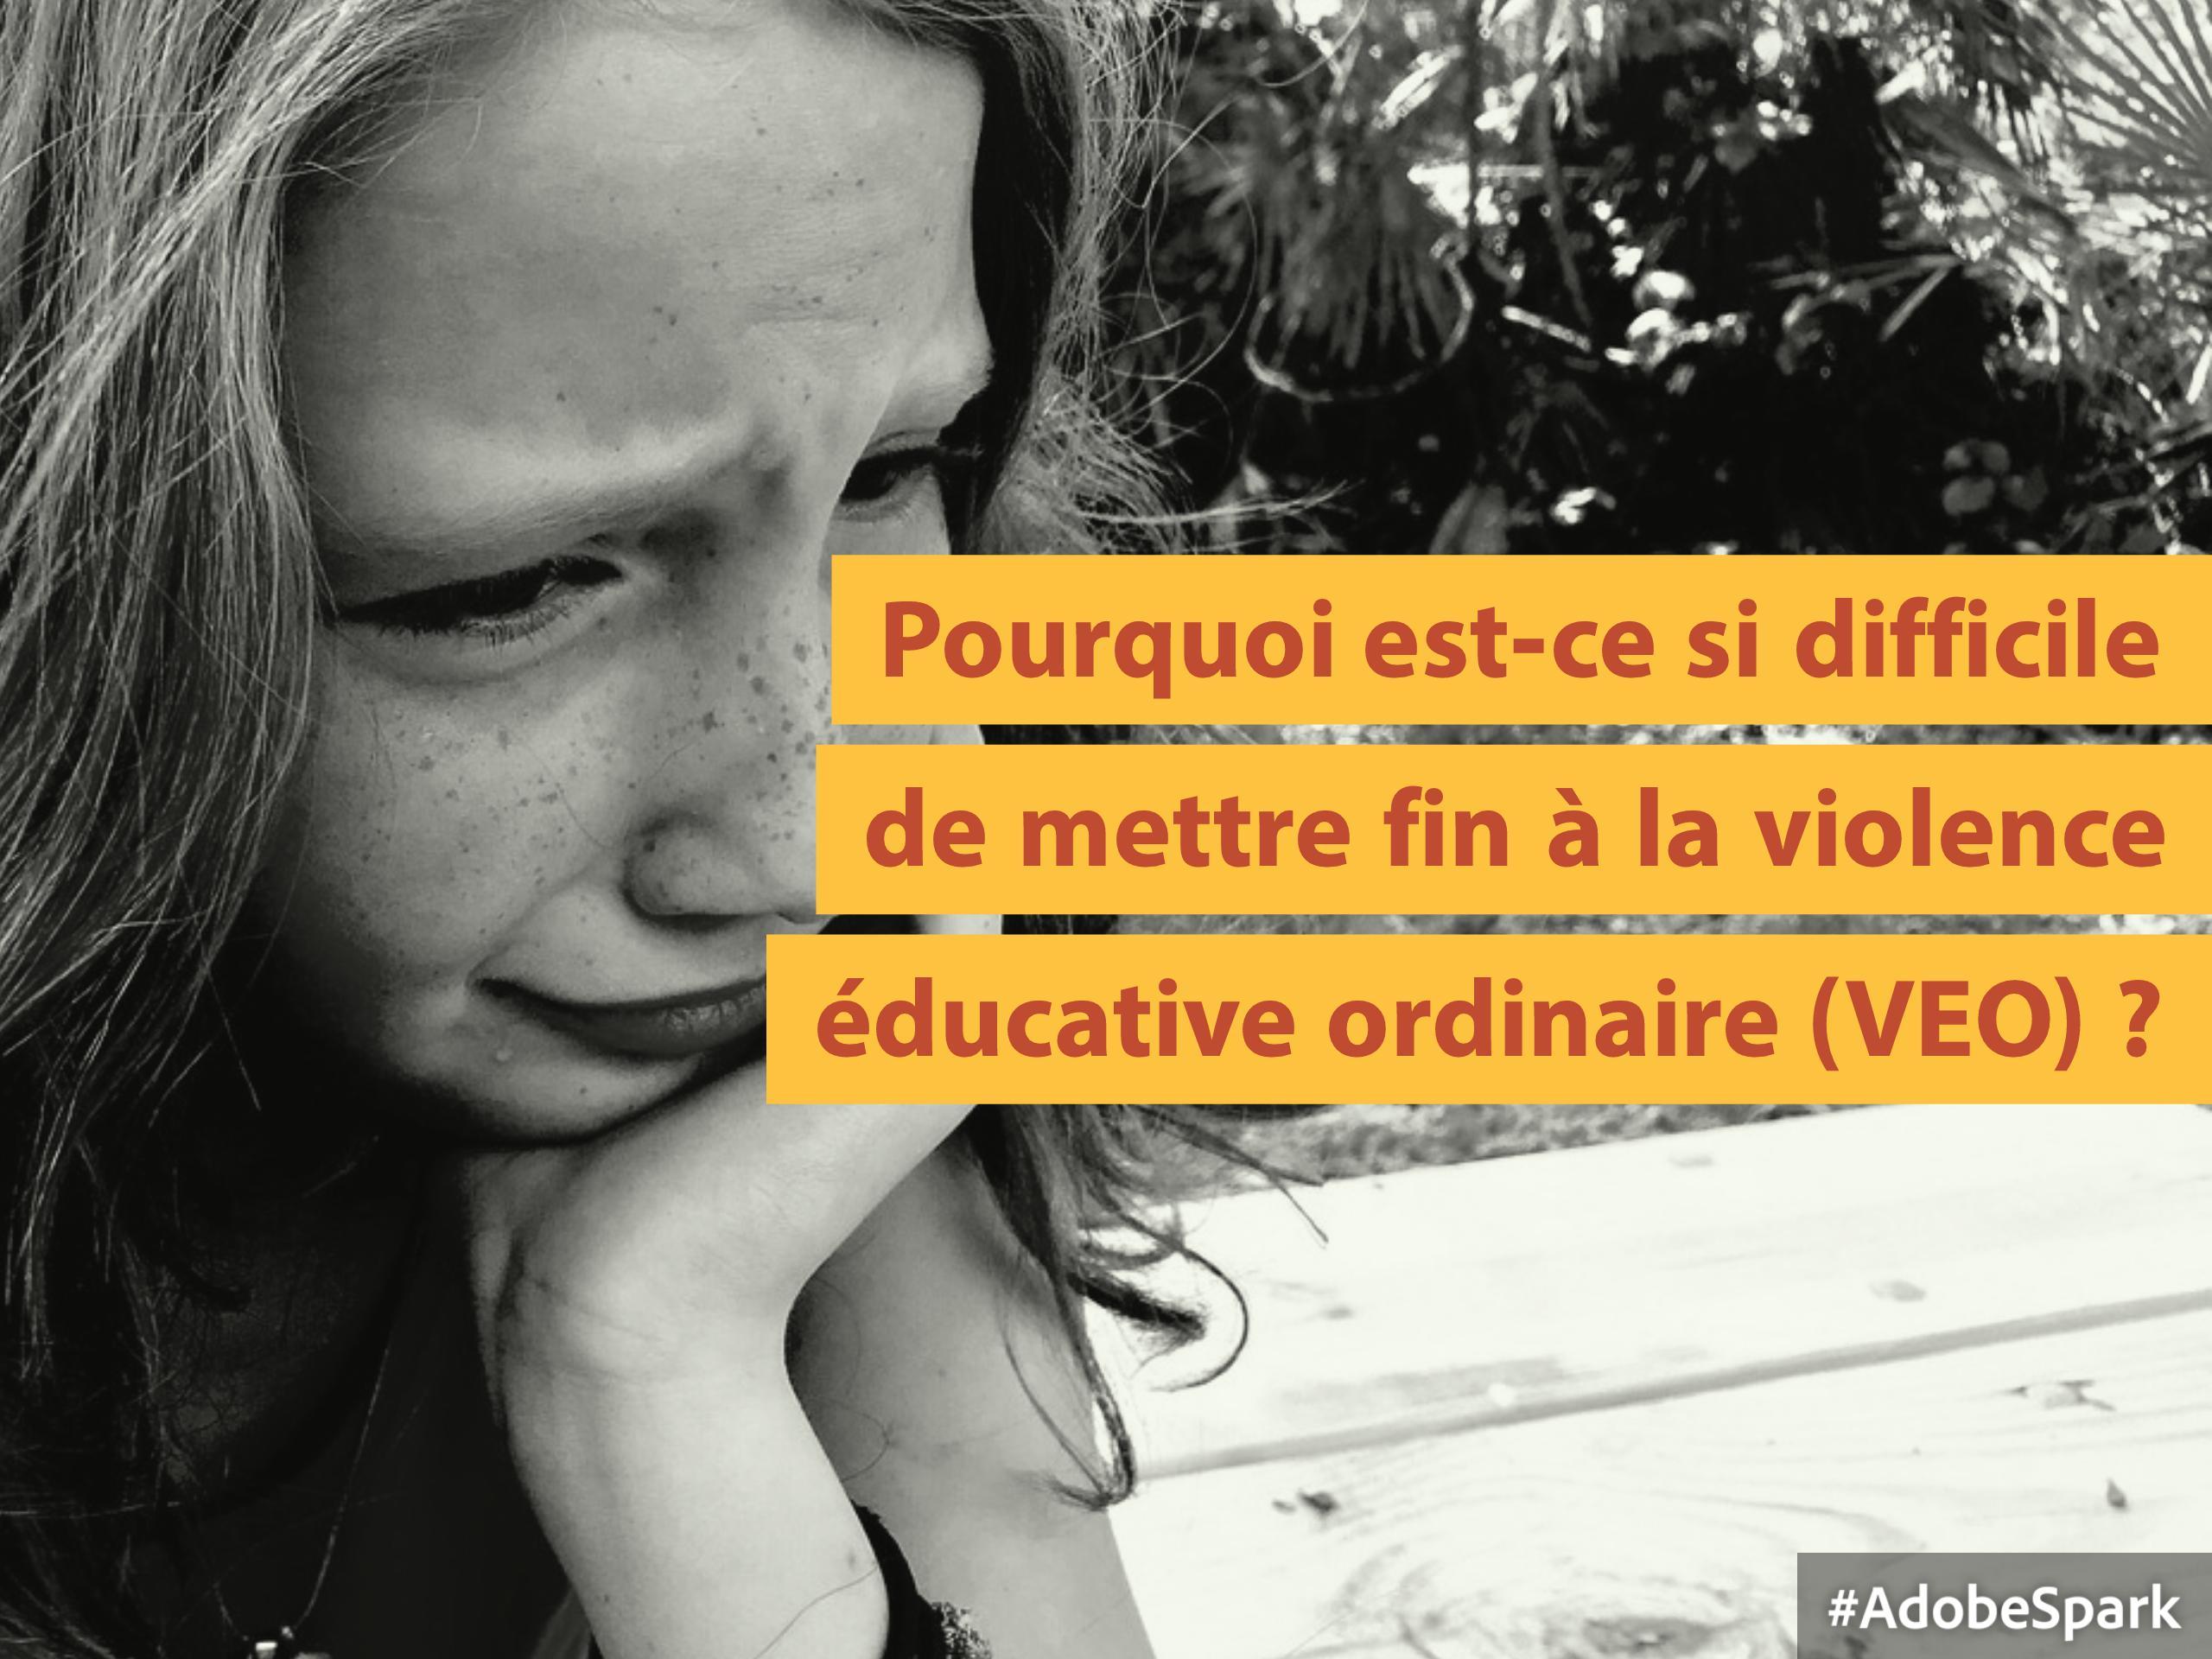 mettre fin violence éducative ordinaire